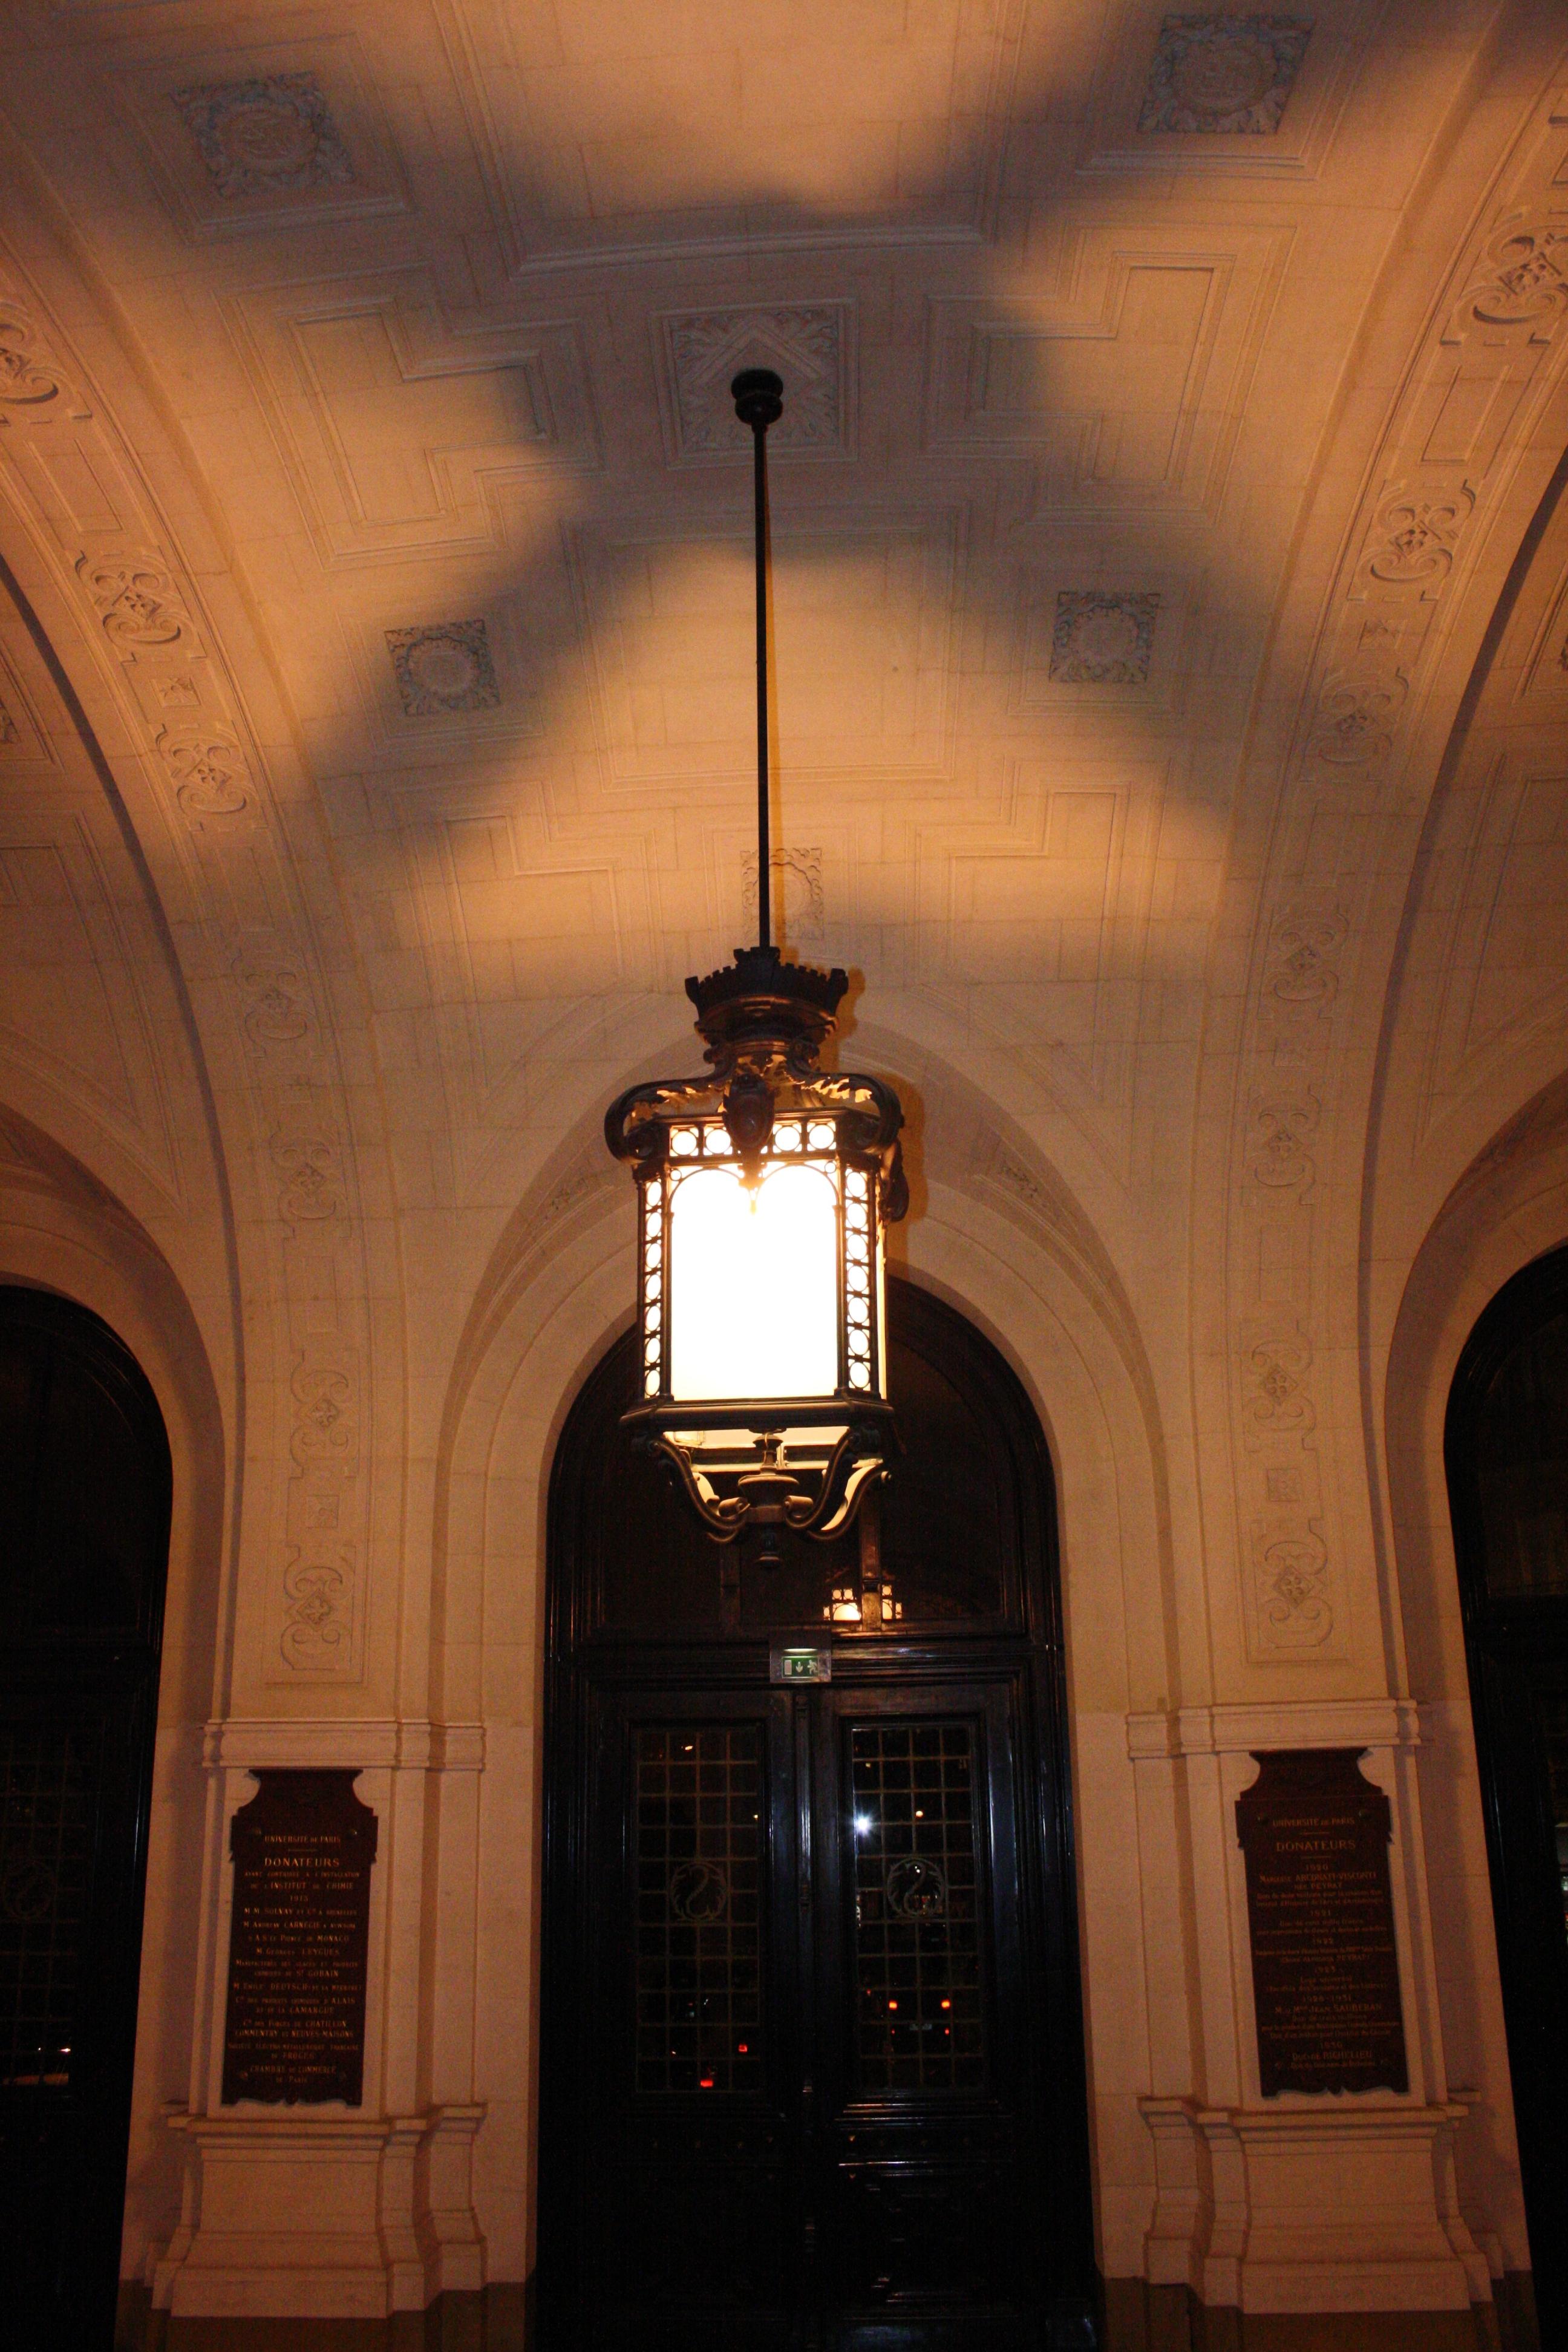 filela sorbonne hall lighting type. File:La Sorbonne Hall Ceiling Light.jpg Filela Sorbonne Hall Lighting Type L